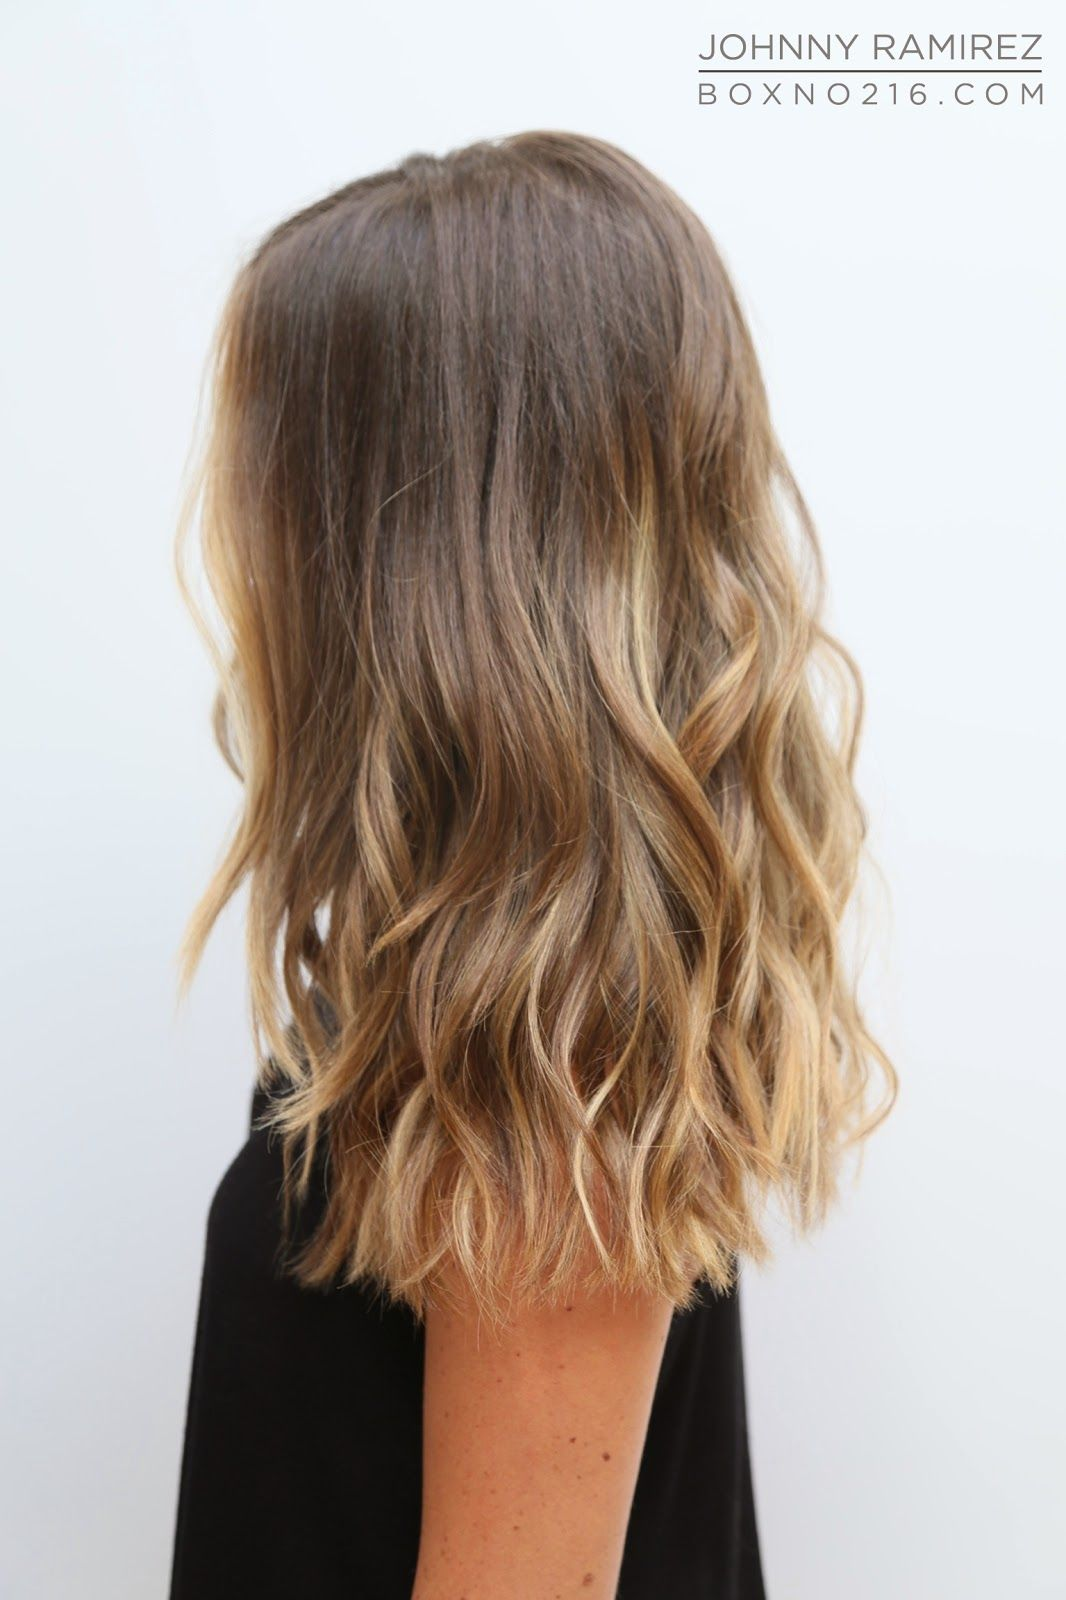 Pin By Ali Powers On Make Me Pretty Pinterest Blondes Salons